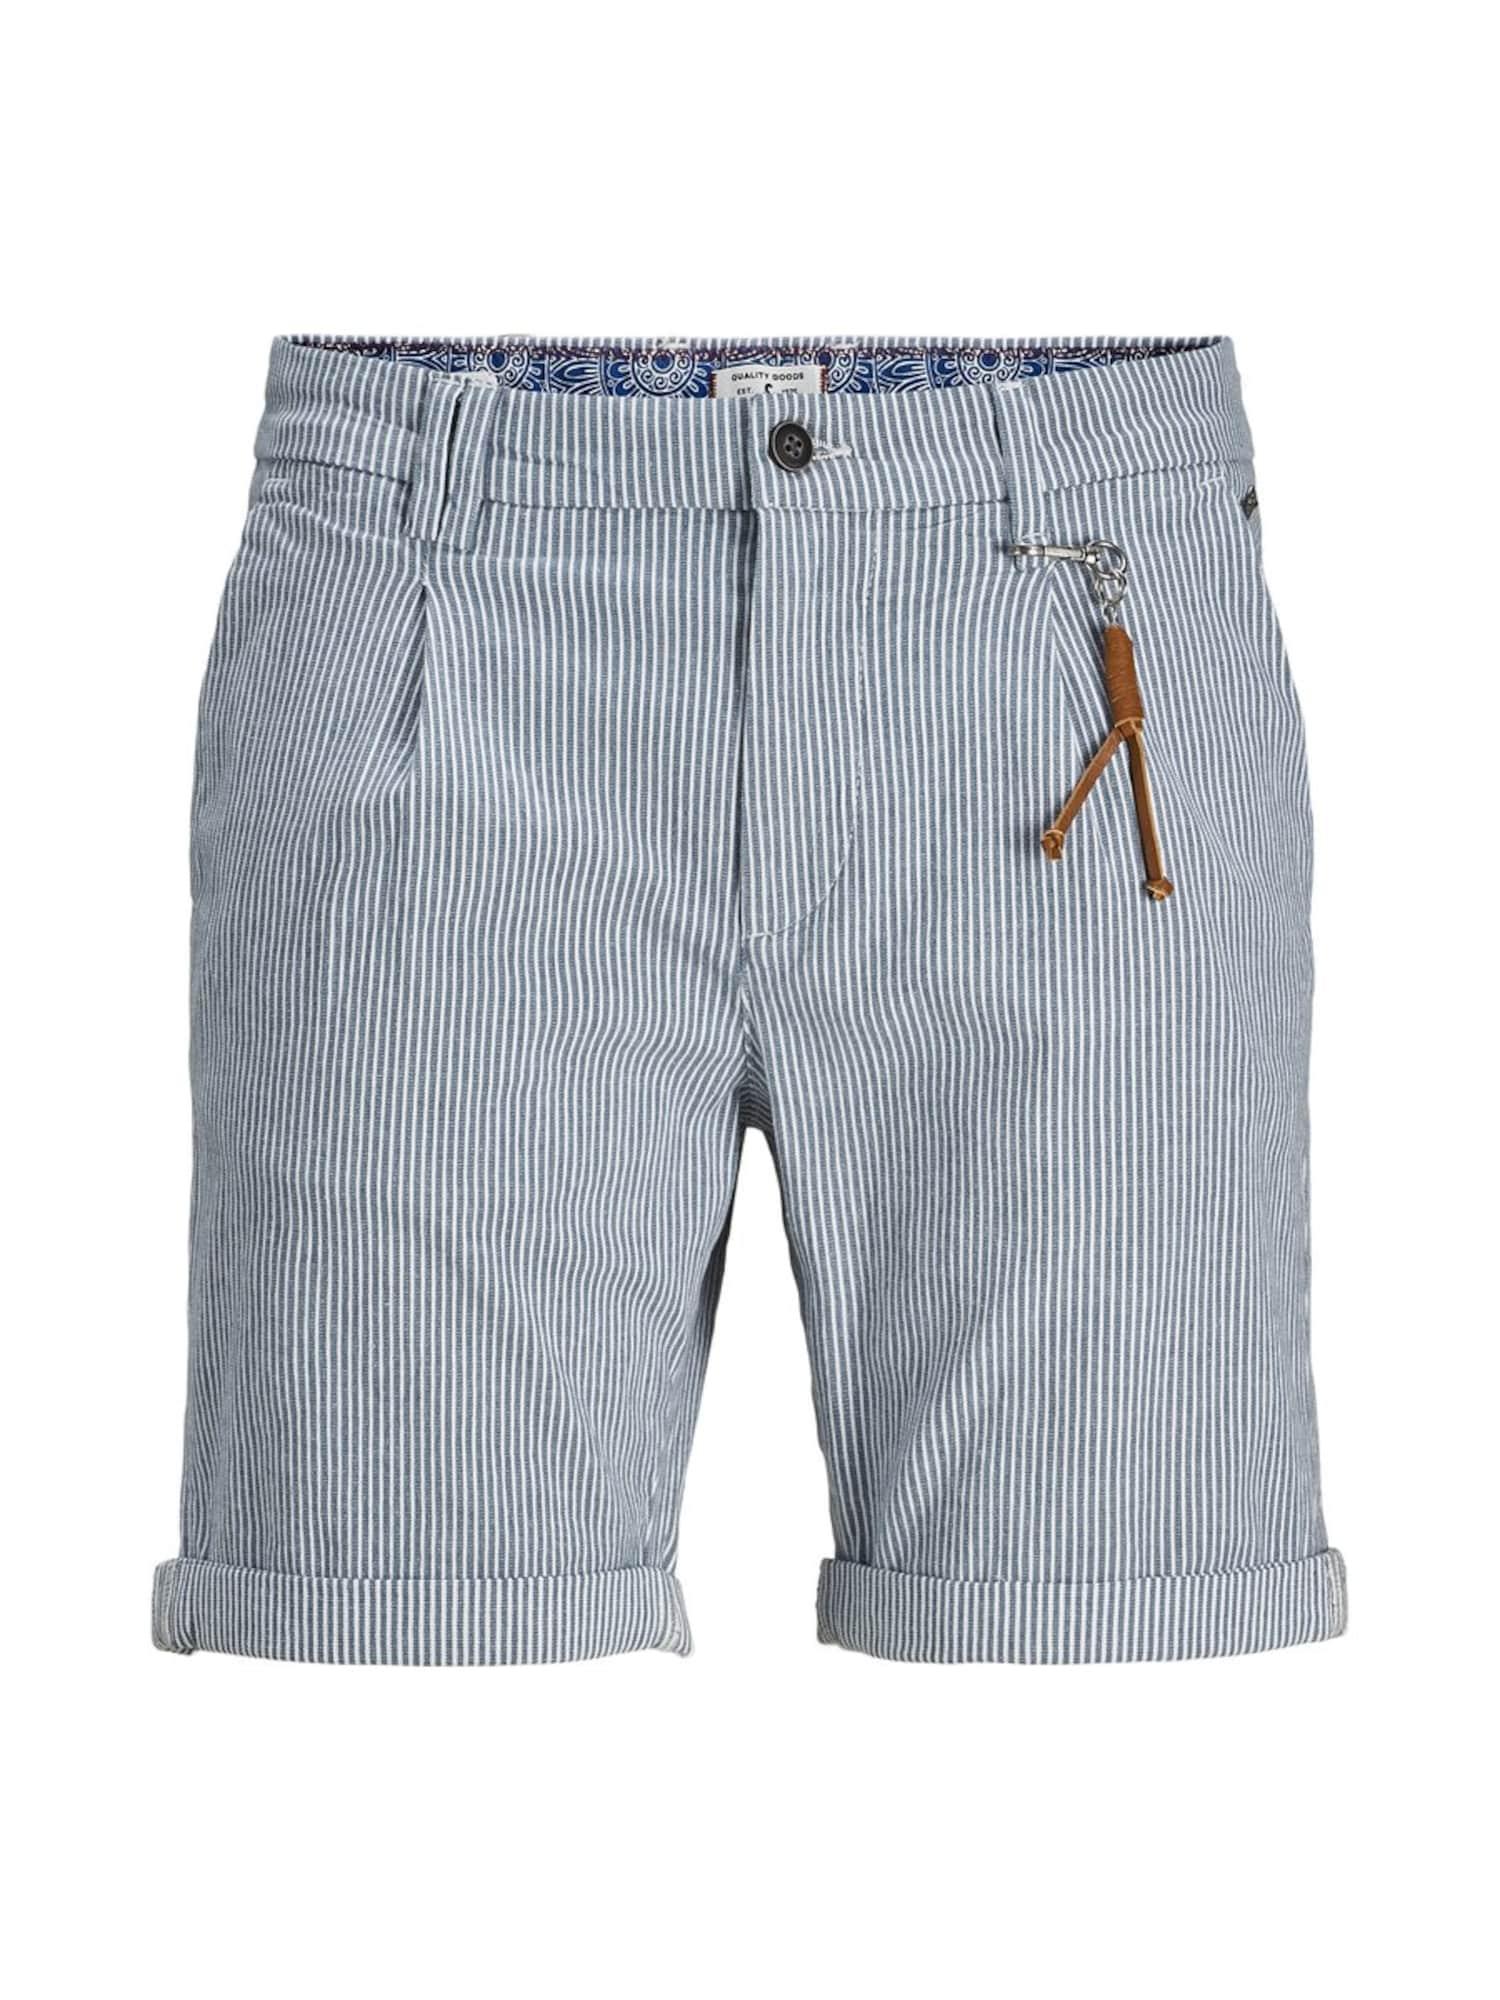 JACK & JONES Plisované nohavice 'Milton AKM 935'  modré / biela